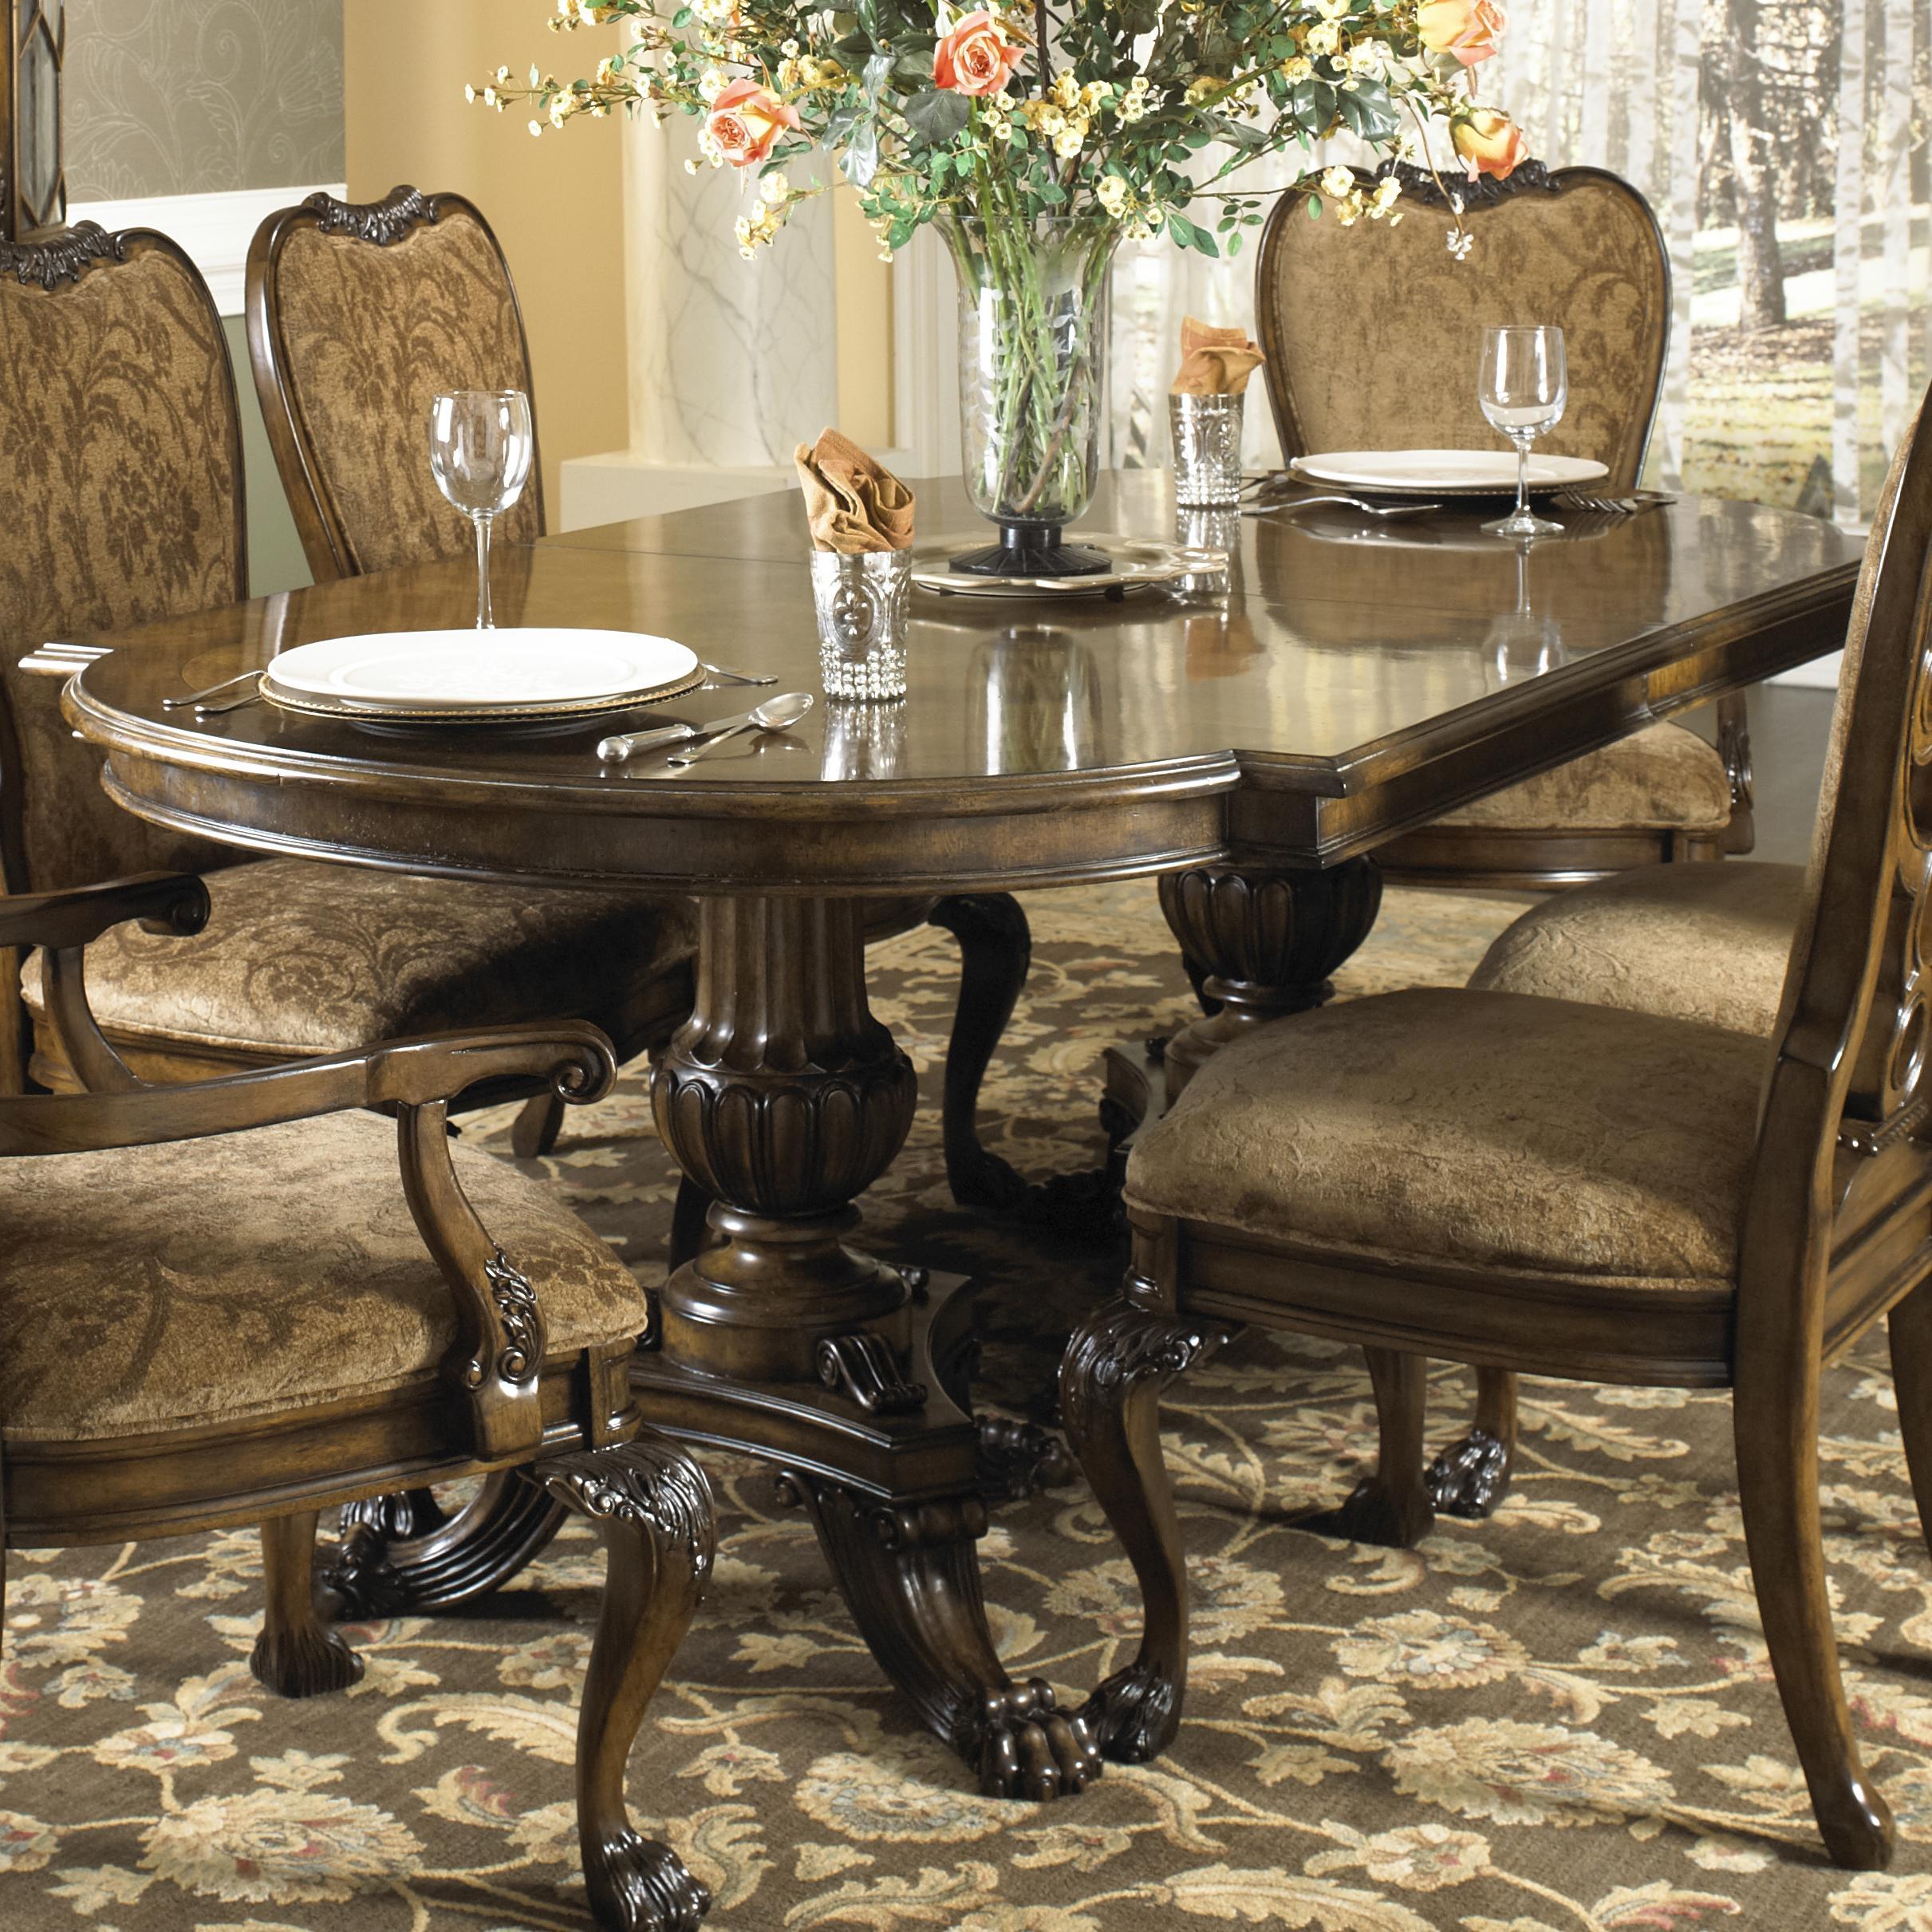 Fine Furniture Design Belvedere Formal Dining Table With Two Hand Carved  Pedestals   Baeru0027s Furniture   Dining Tables